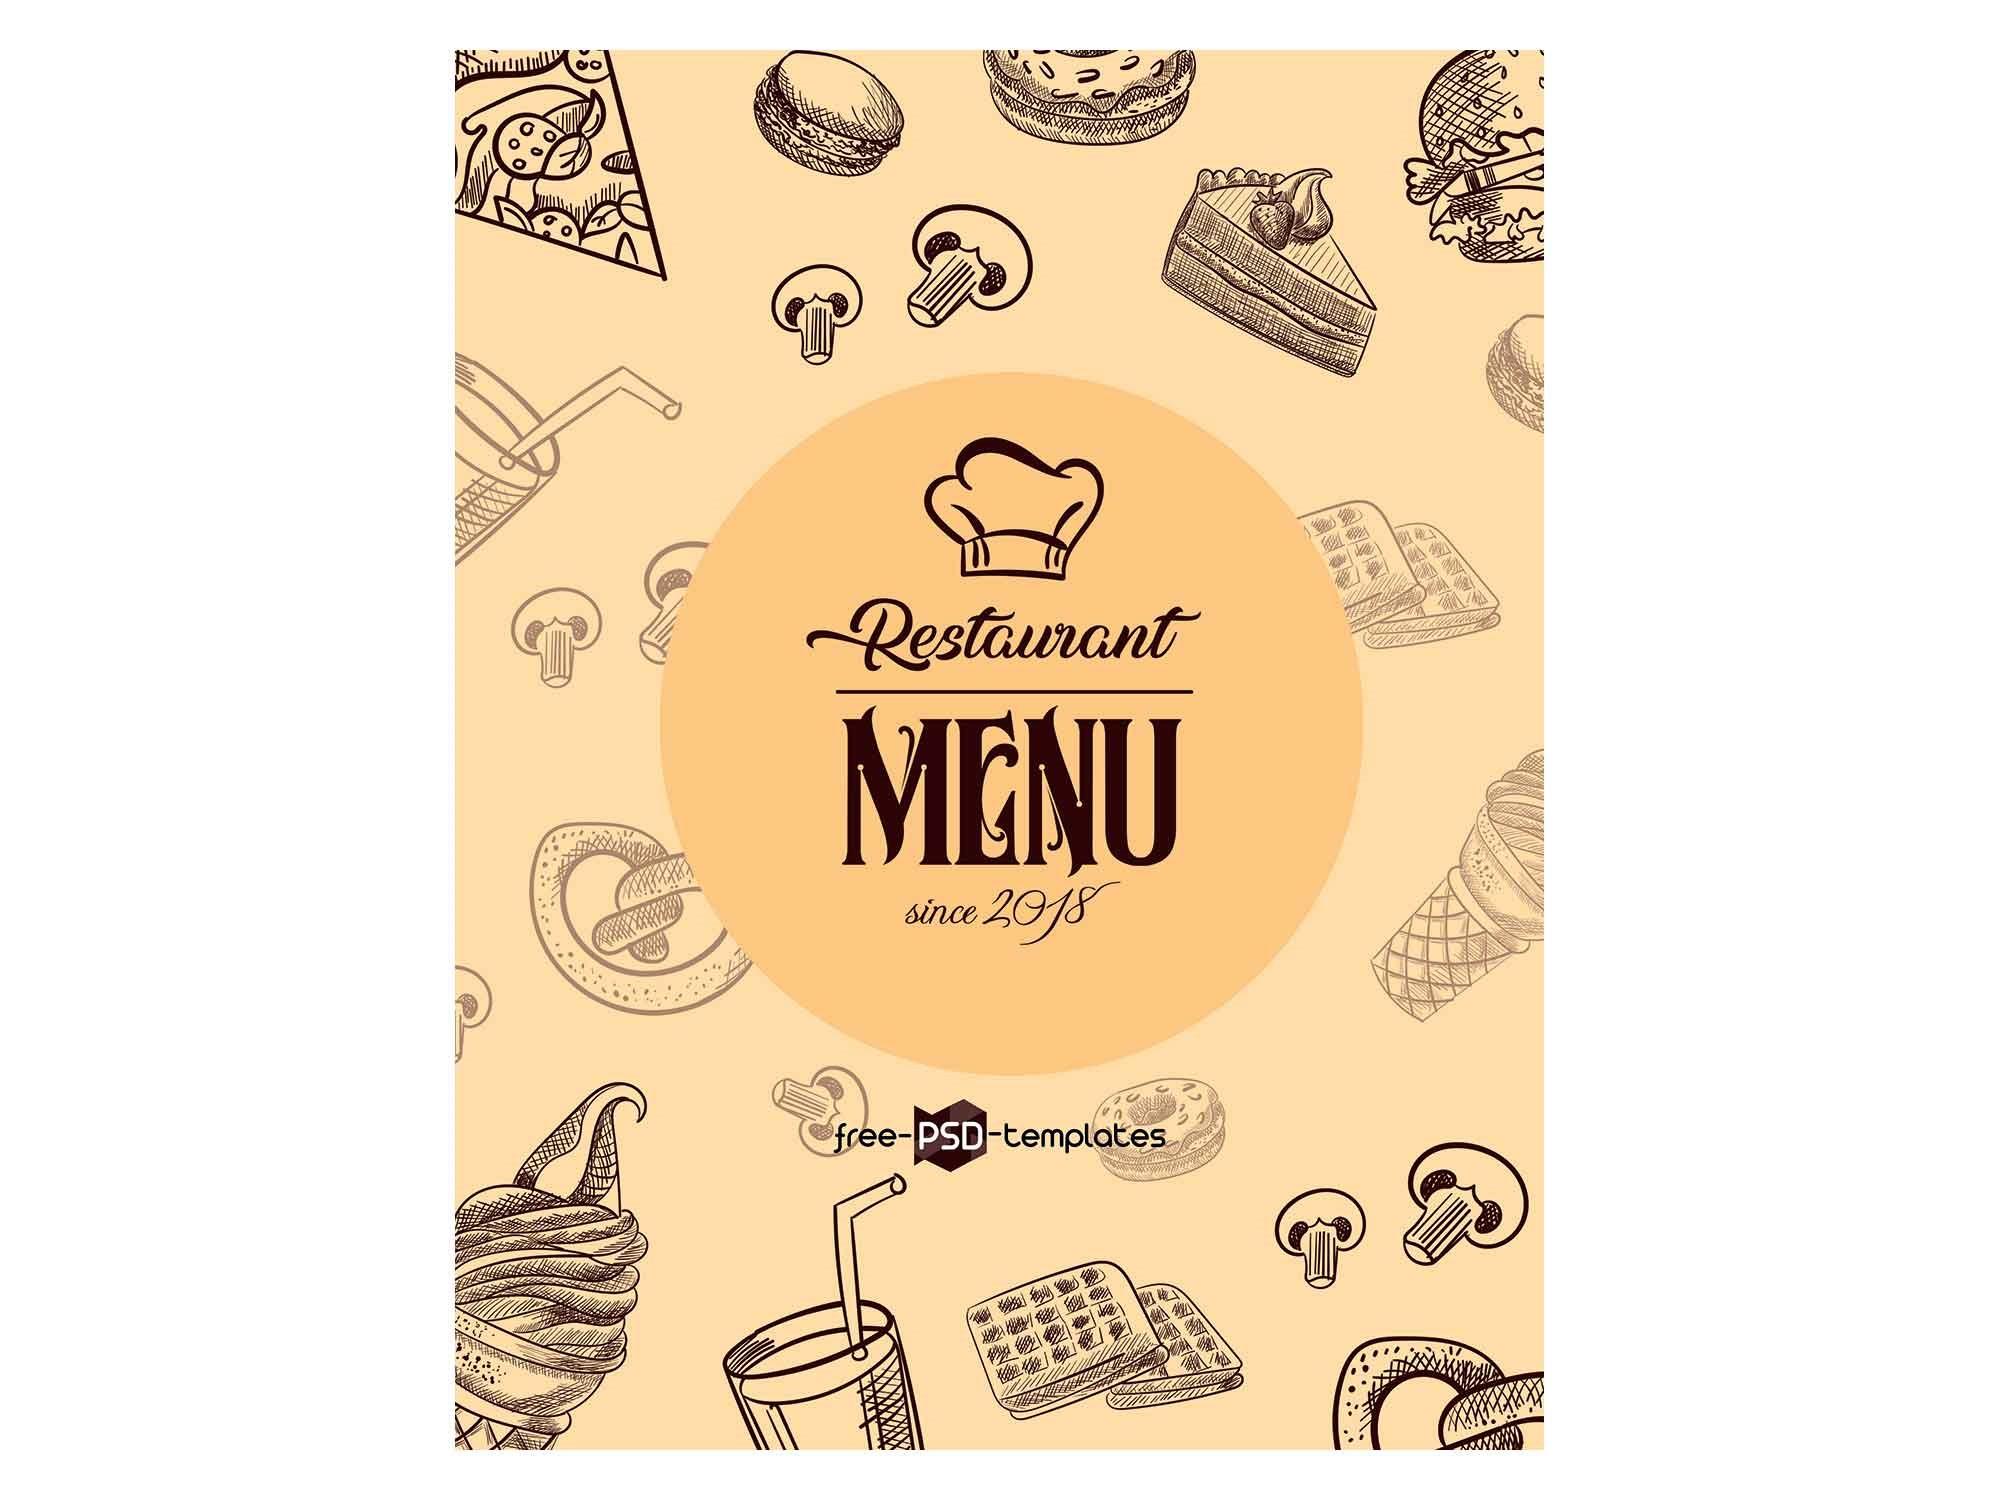 008 Outstanding Blank Restaurant Menu Template Idea  Free Printable DownloadableFull